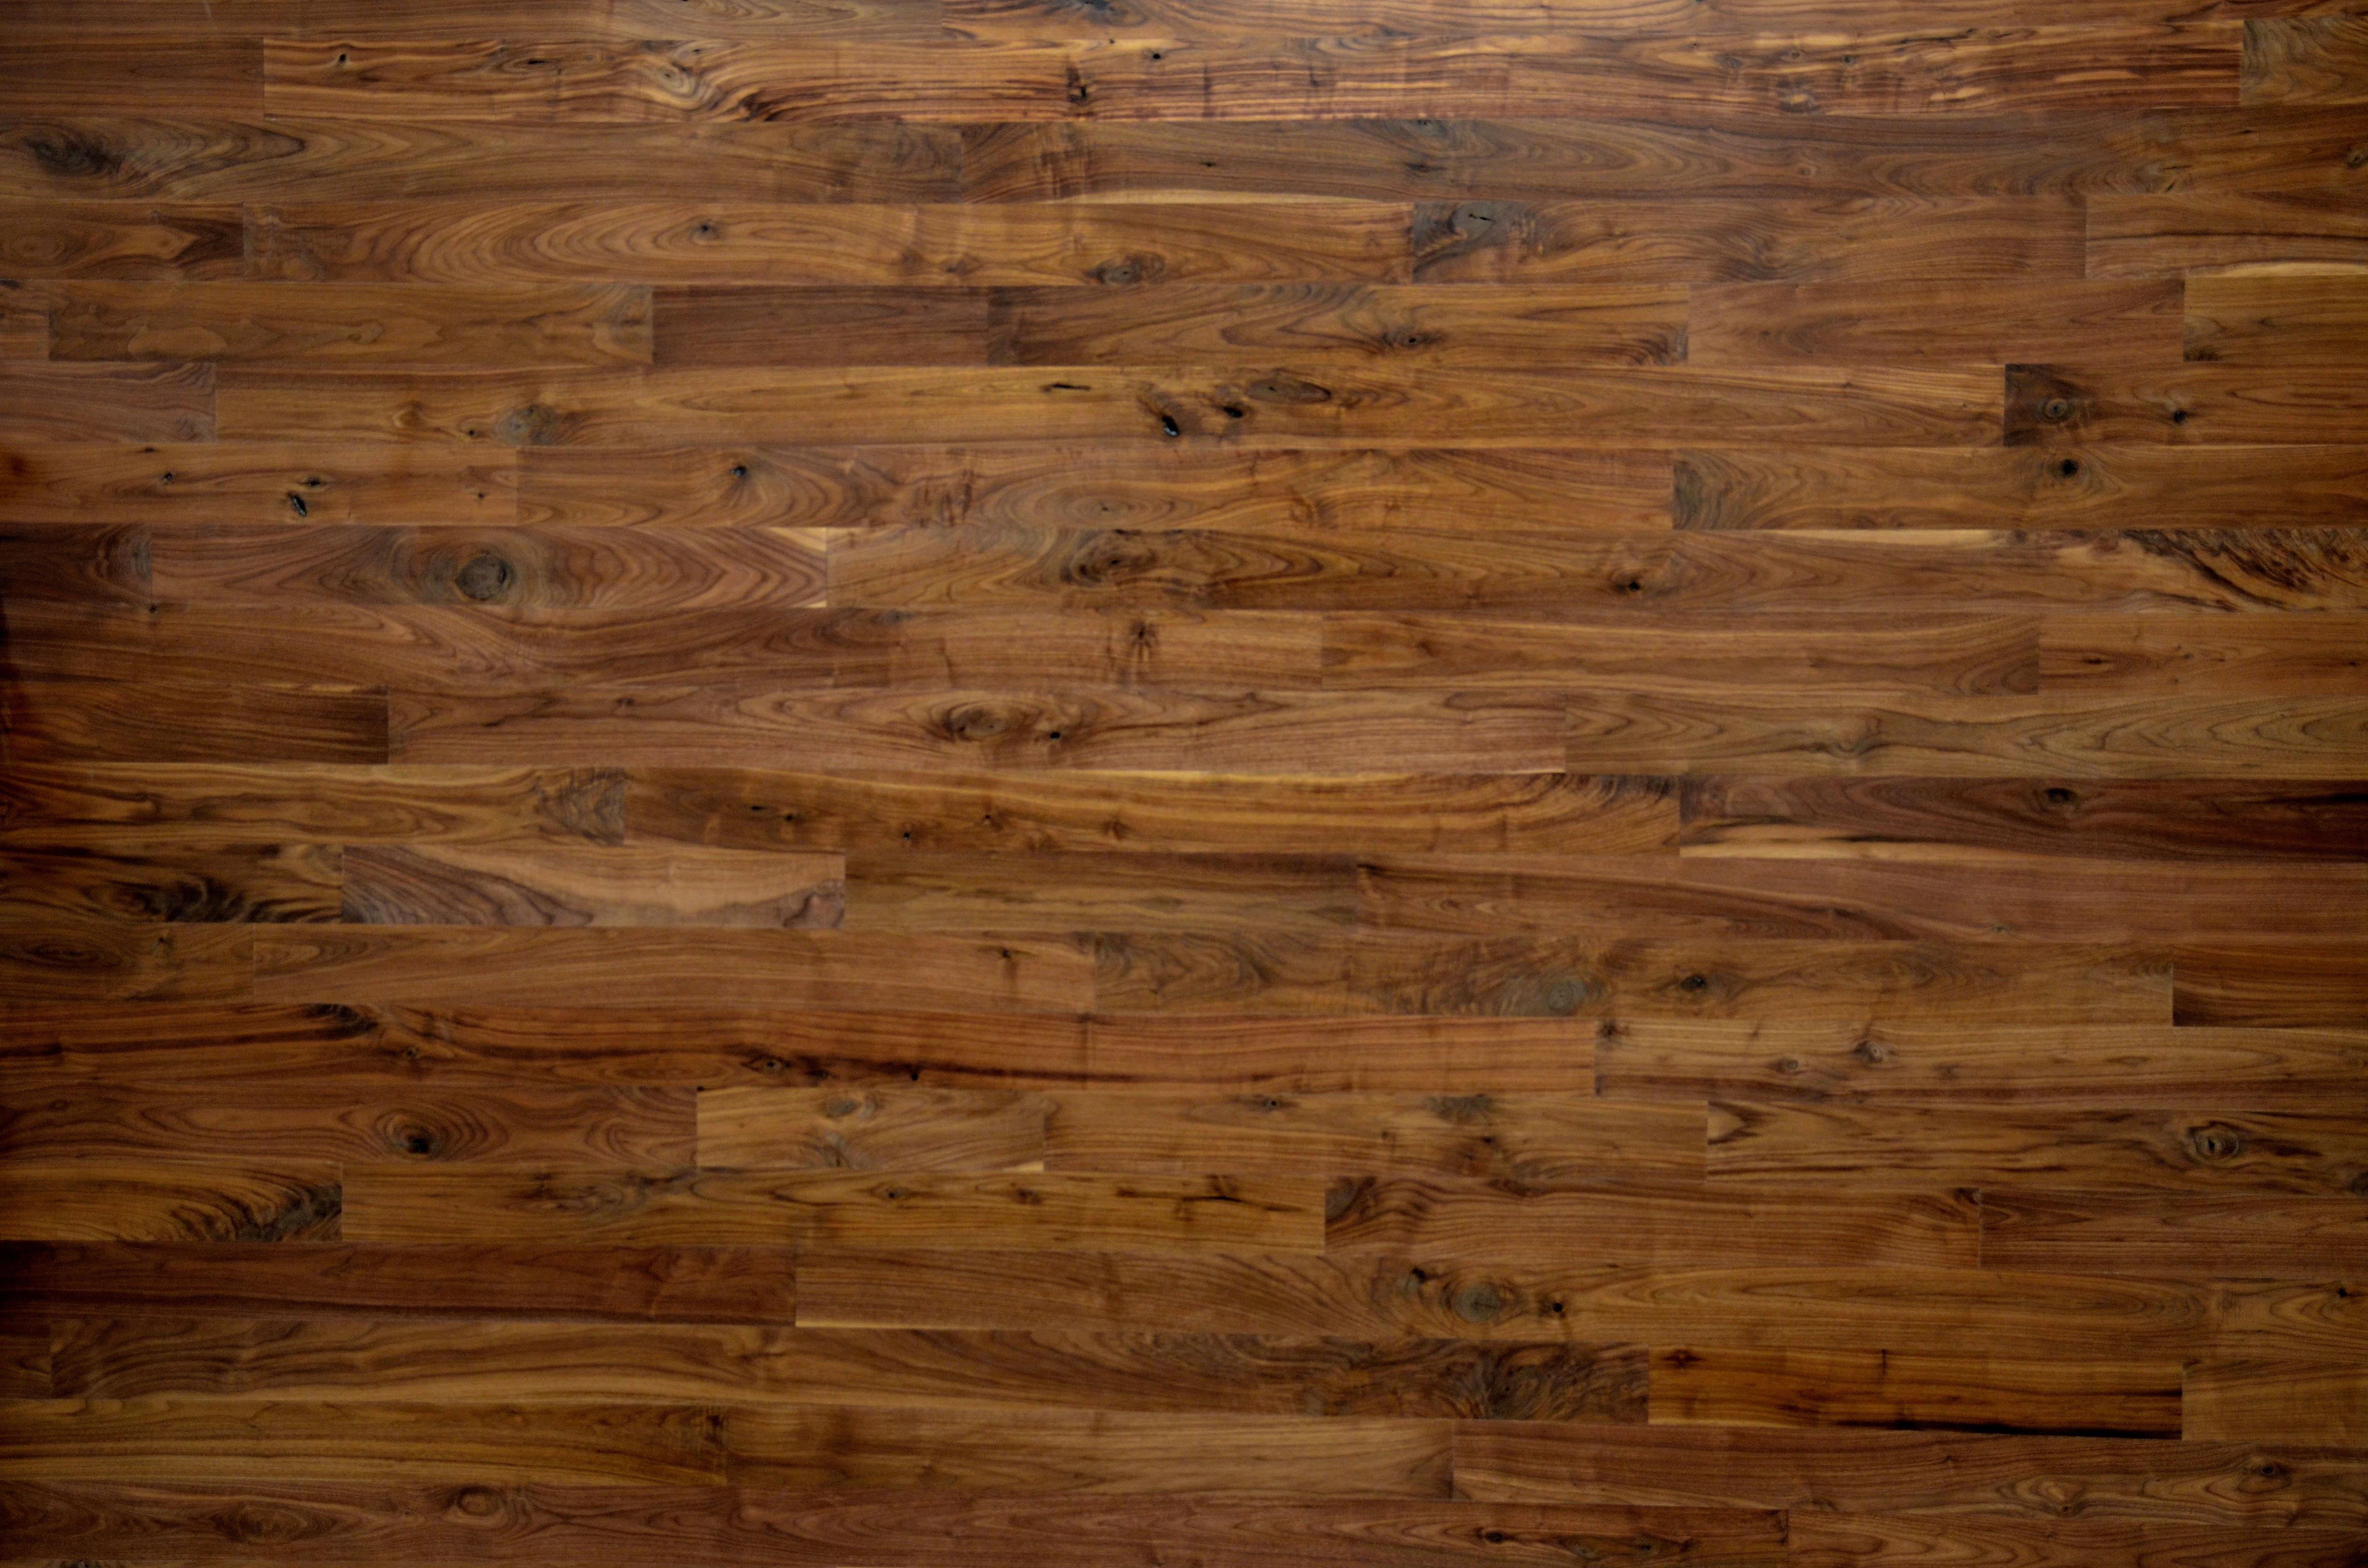 red oak unfinished hardwood flooring for sale of lacrosse hardwood flooring walnut white oak red oak hickory intended for natual walnut